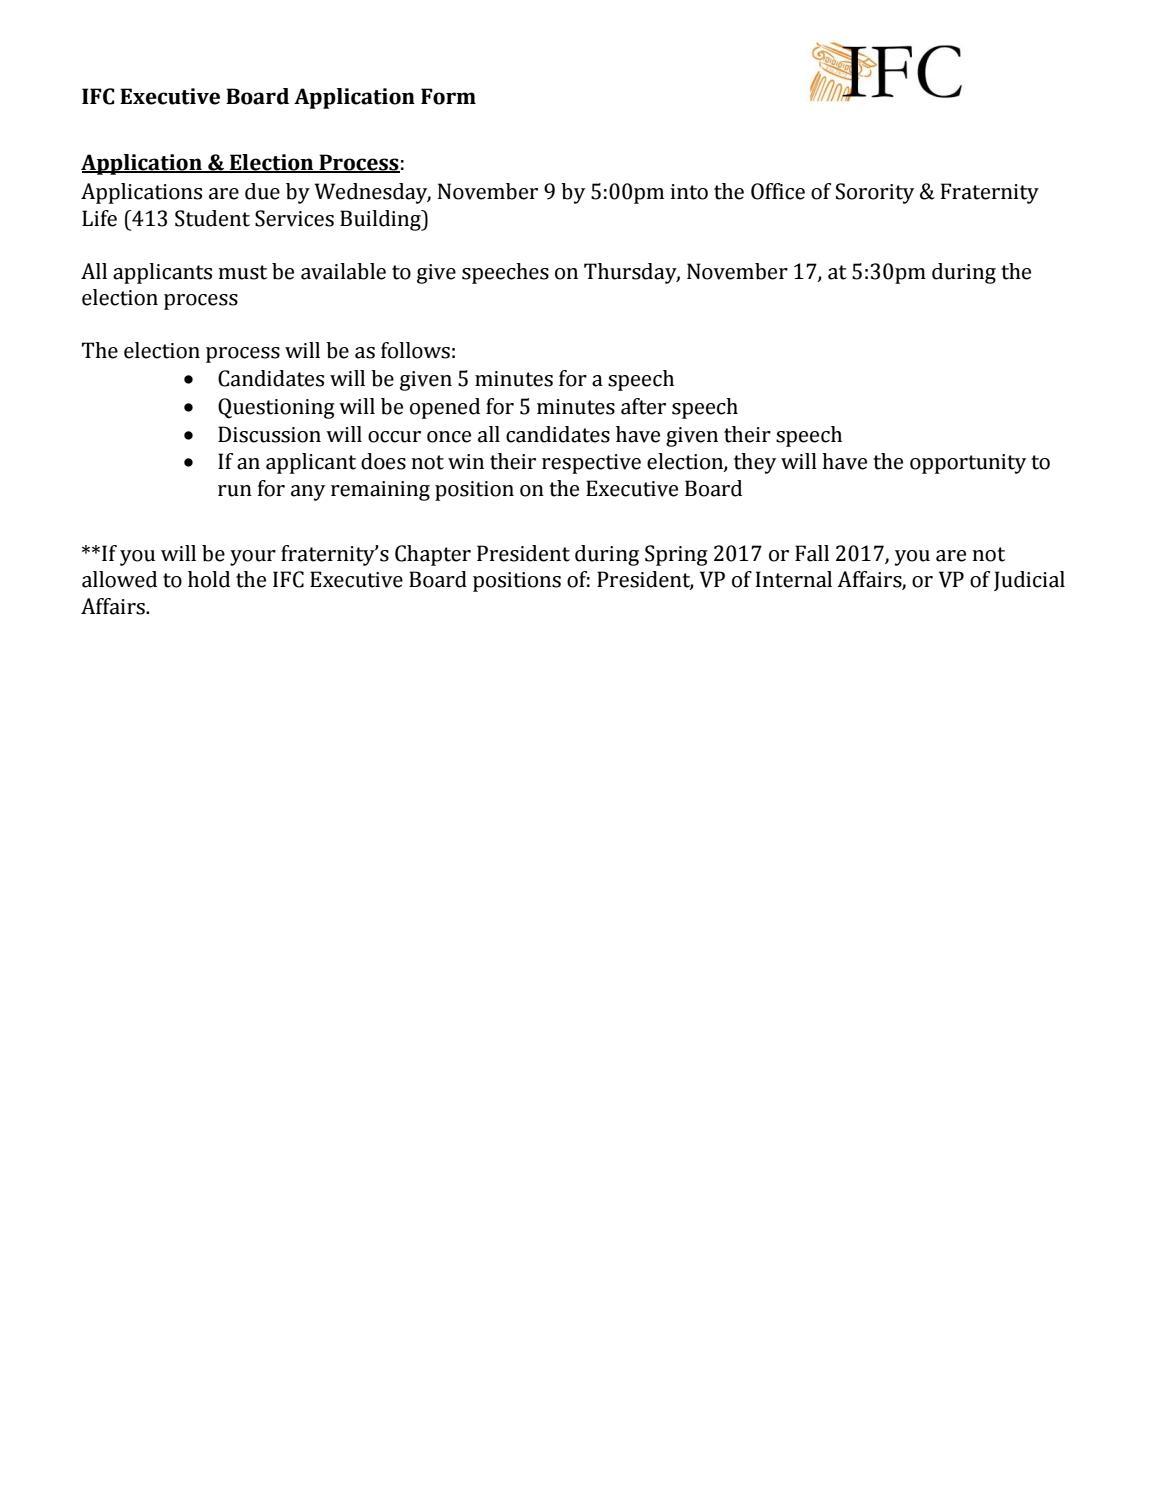 IFC Executive Board Application by UTK Office of Sorority